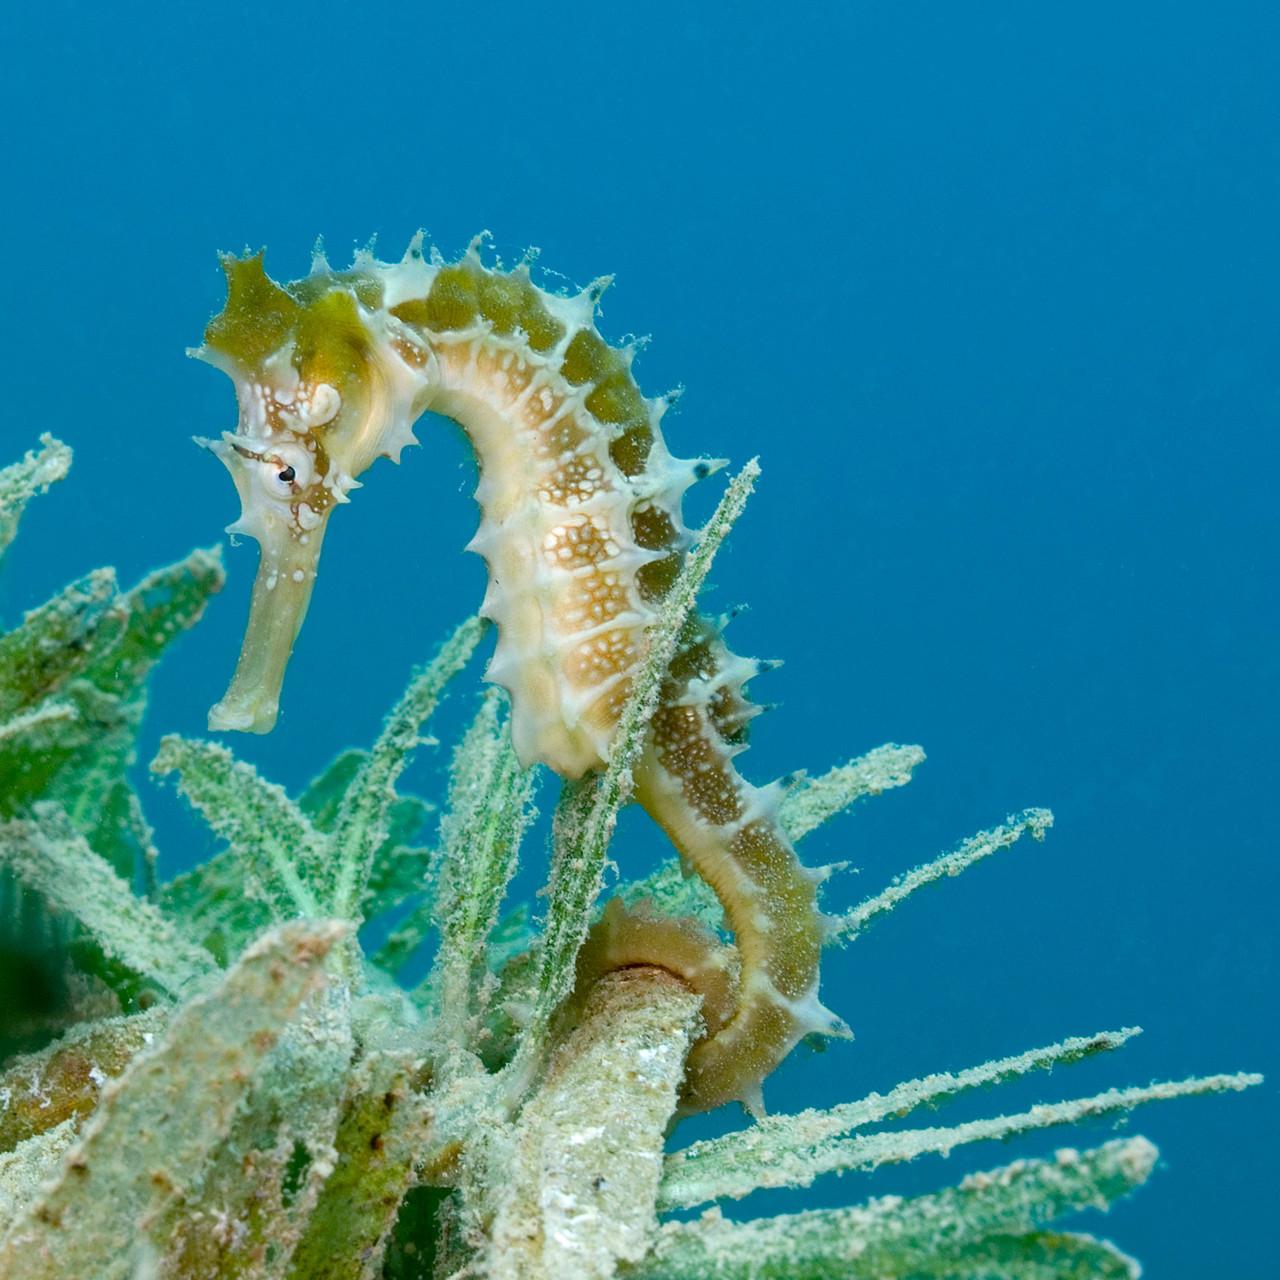 Thorny seahorse, Nuweiba [Egypt, 2010]